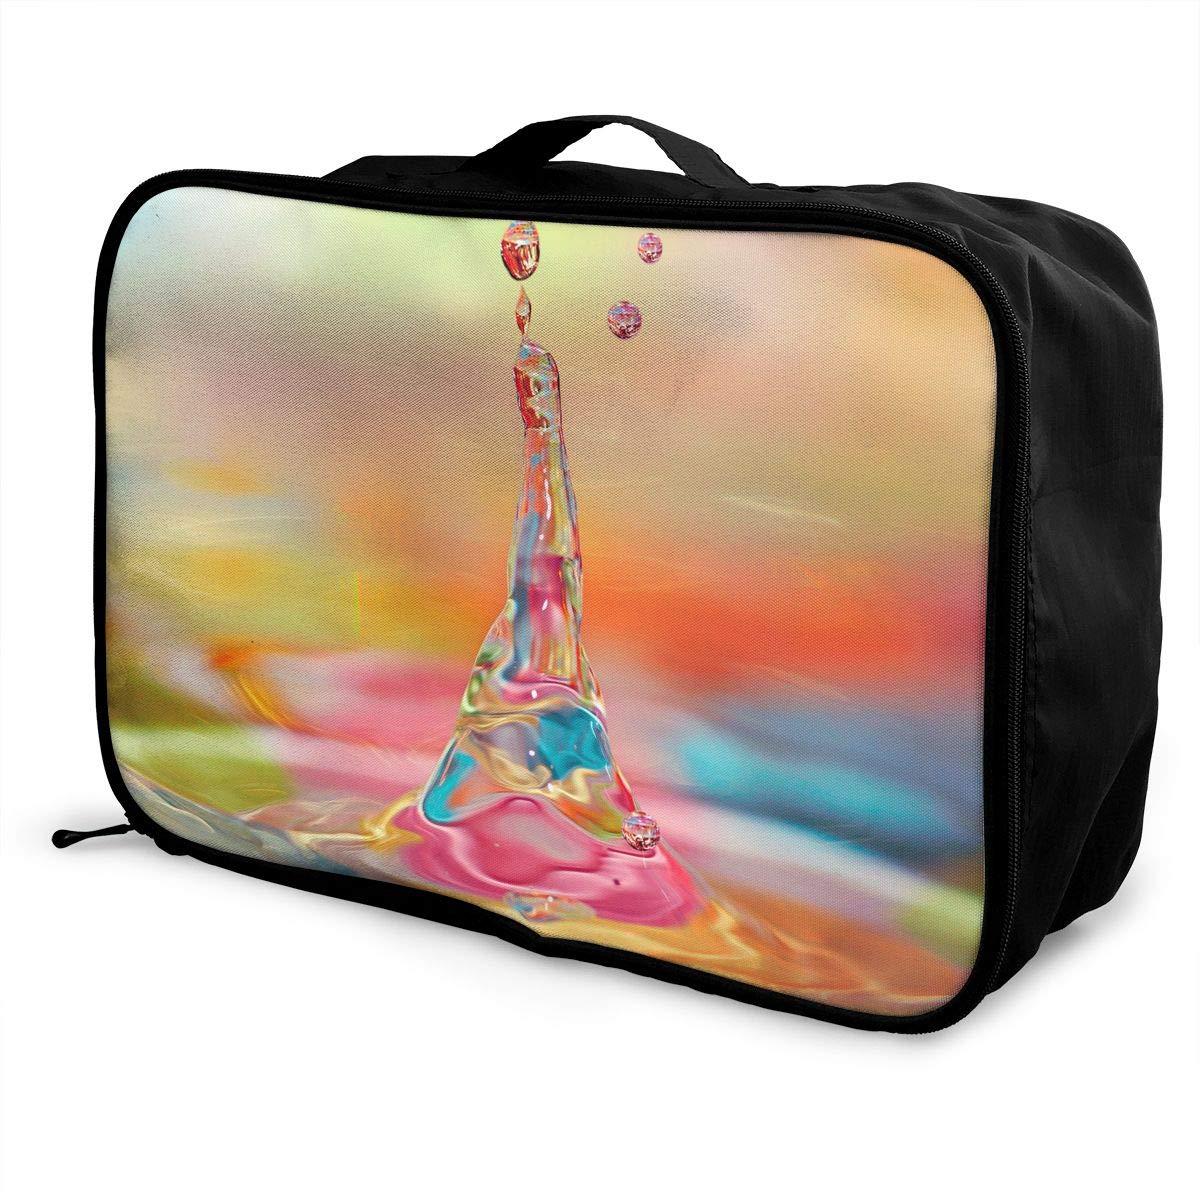 Travel Luggage Duffle Bag Lightweight Portable Handbag Colorful Water Drop Large Capacity Waterproof Foldable Storage Tote